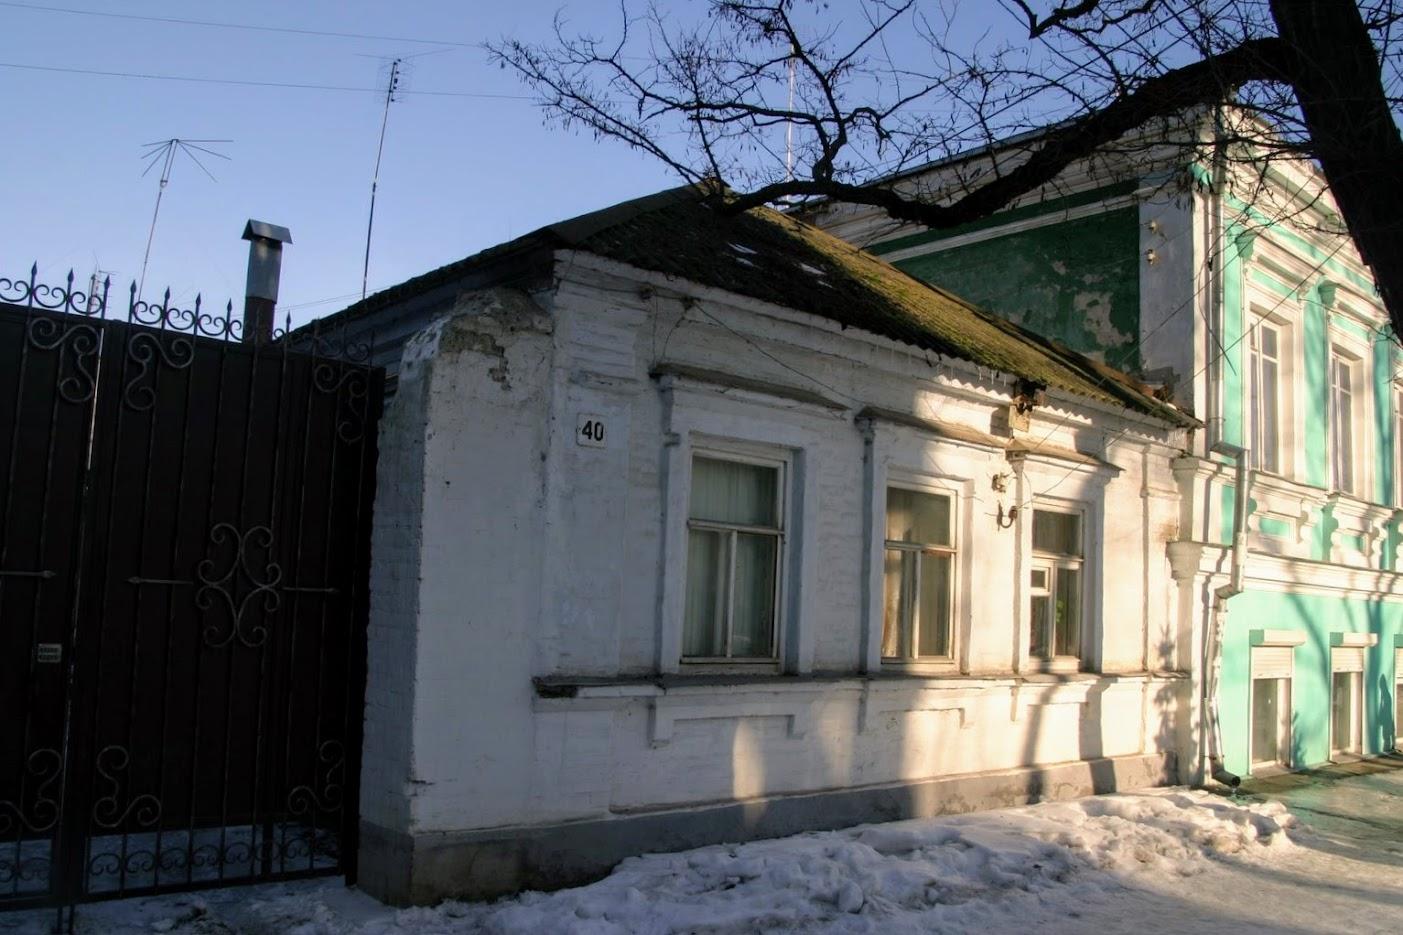 https://sites.google.com/site/istoriceskijtaganrog/cehova-ulica/dom-40